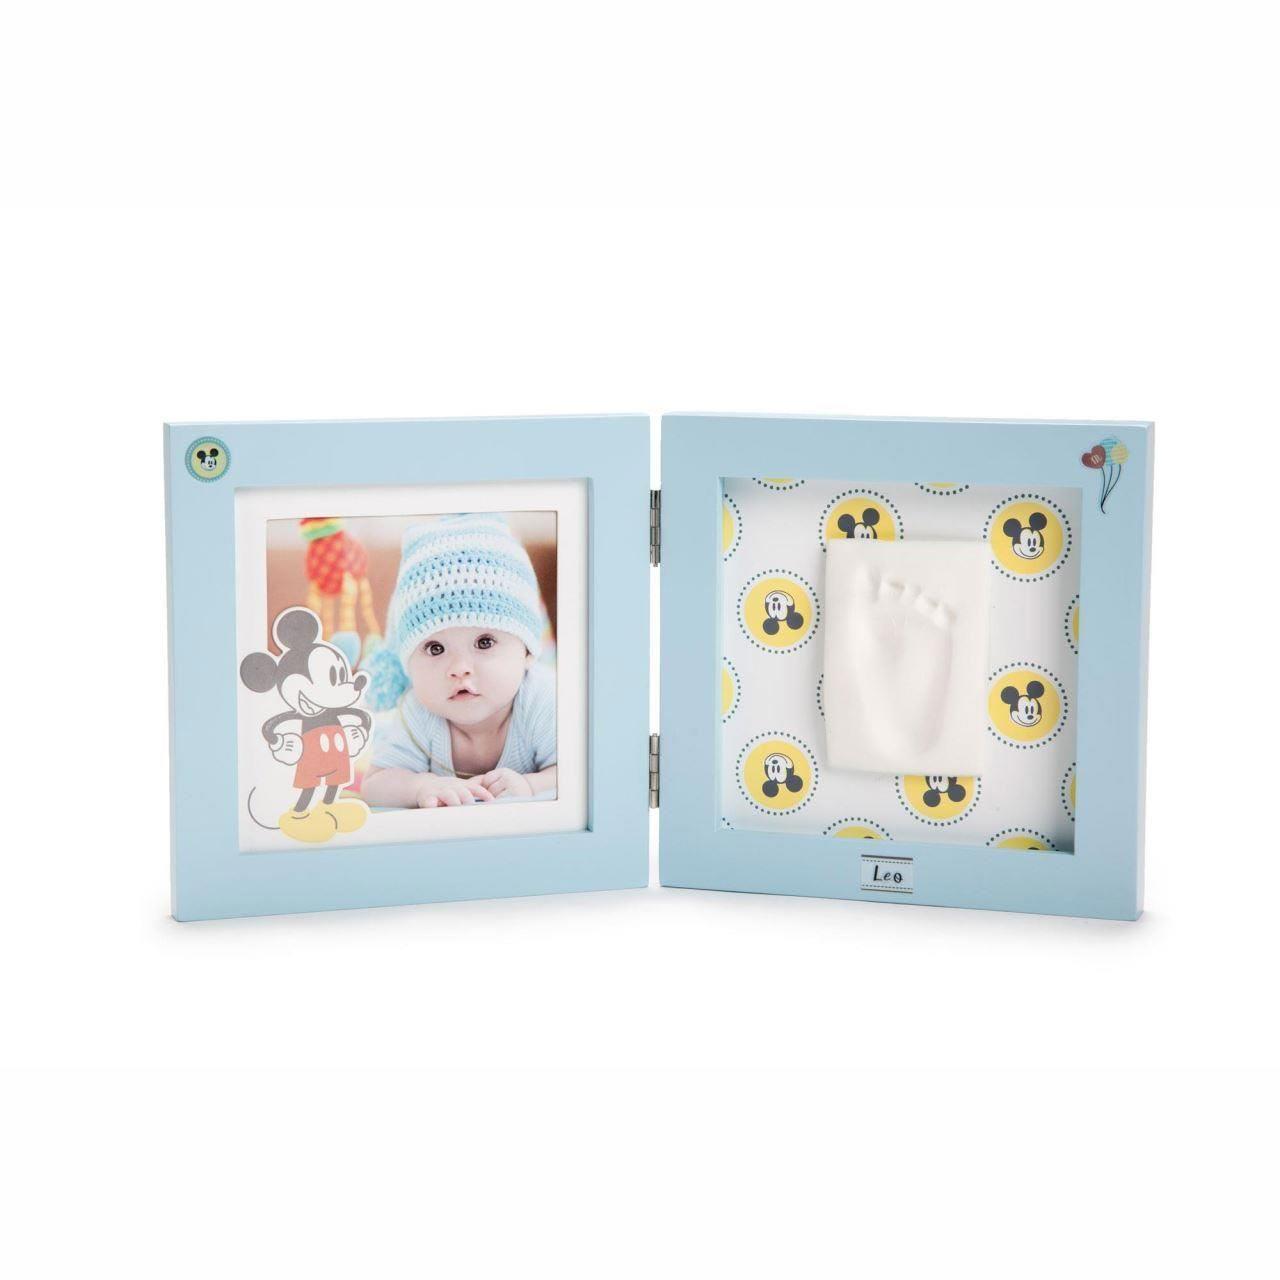 Disney Baby Prints - Kit rama foto dubla amprenta mulaj manuta sau piciorus Mickey Mouse